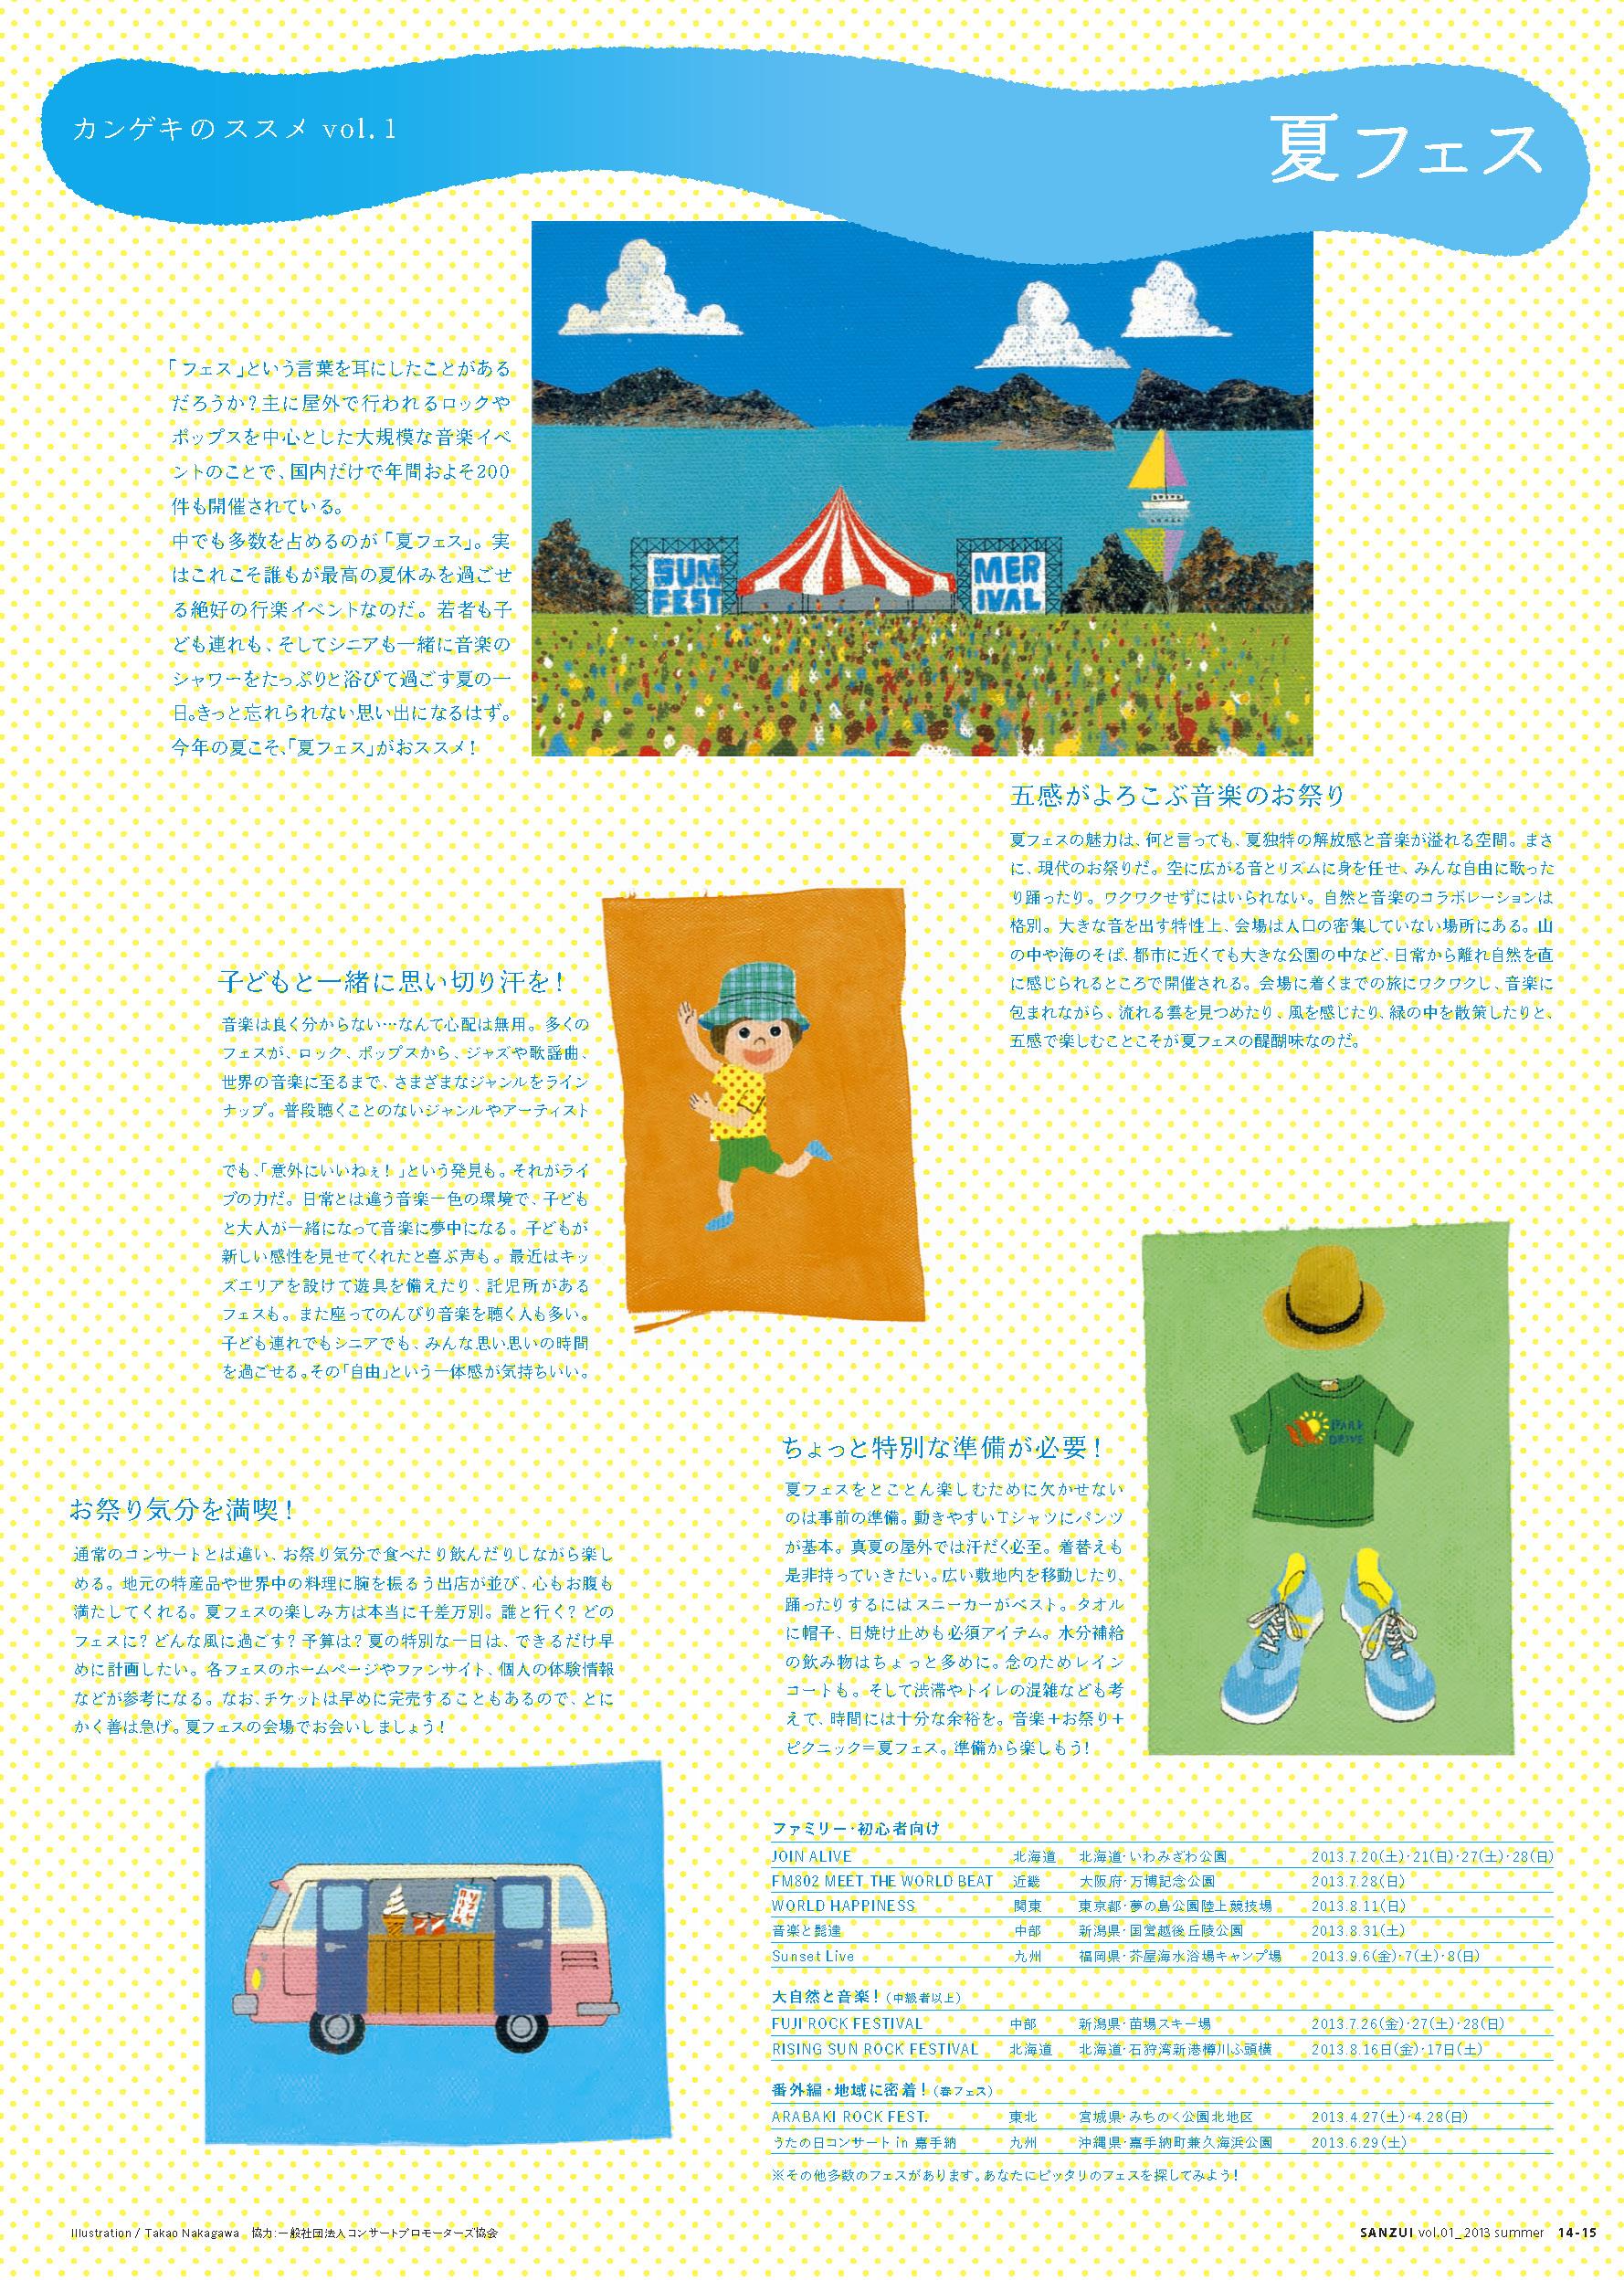 sanzui01_08.jpg